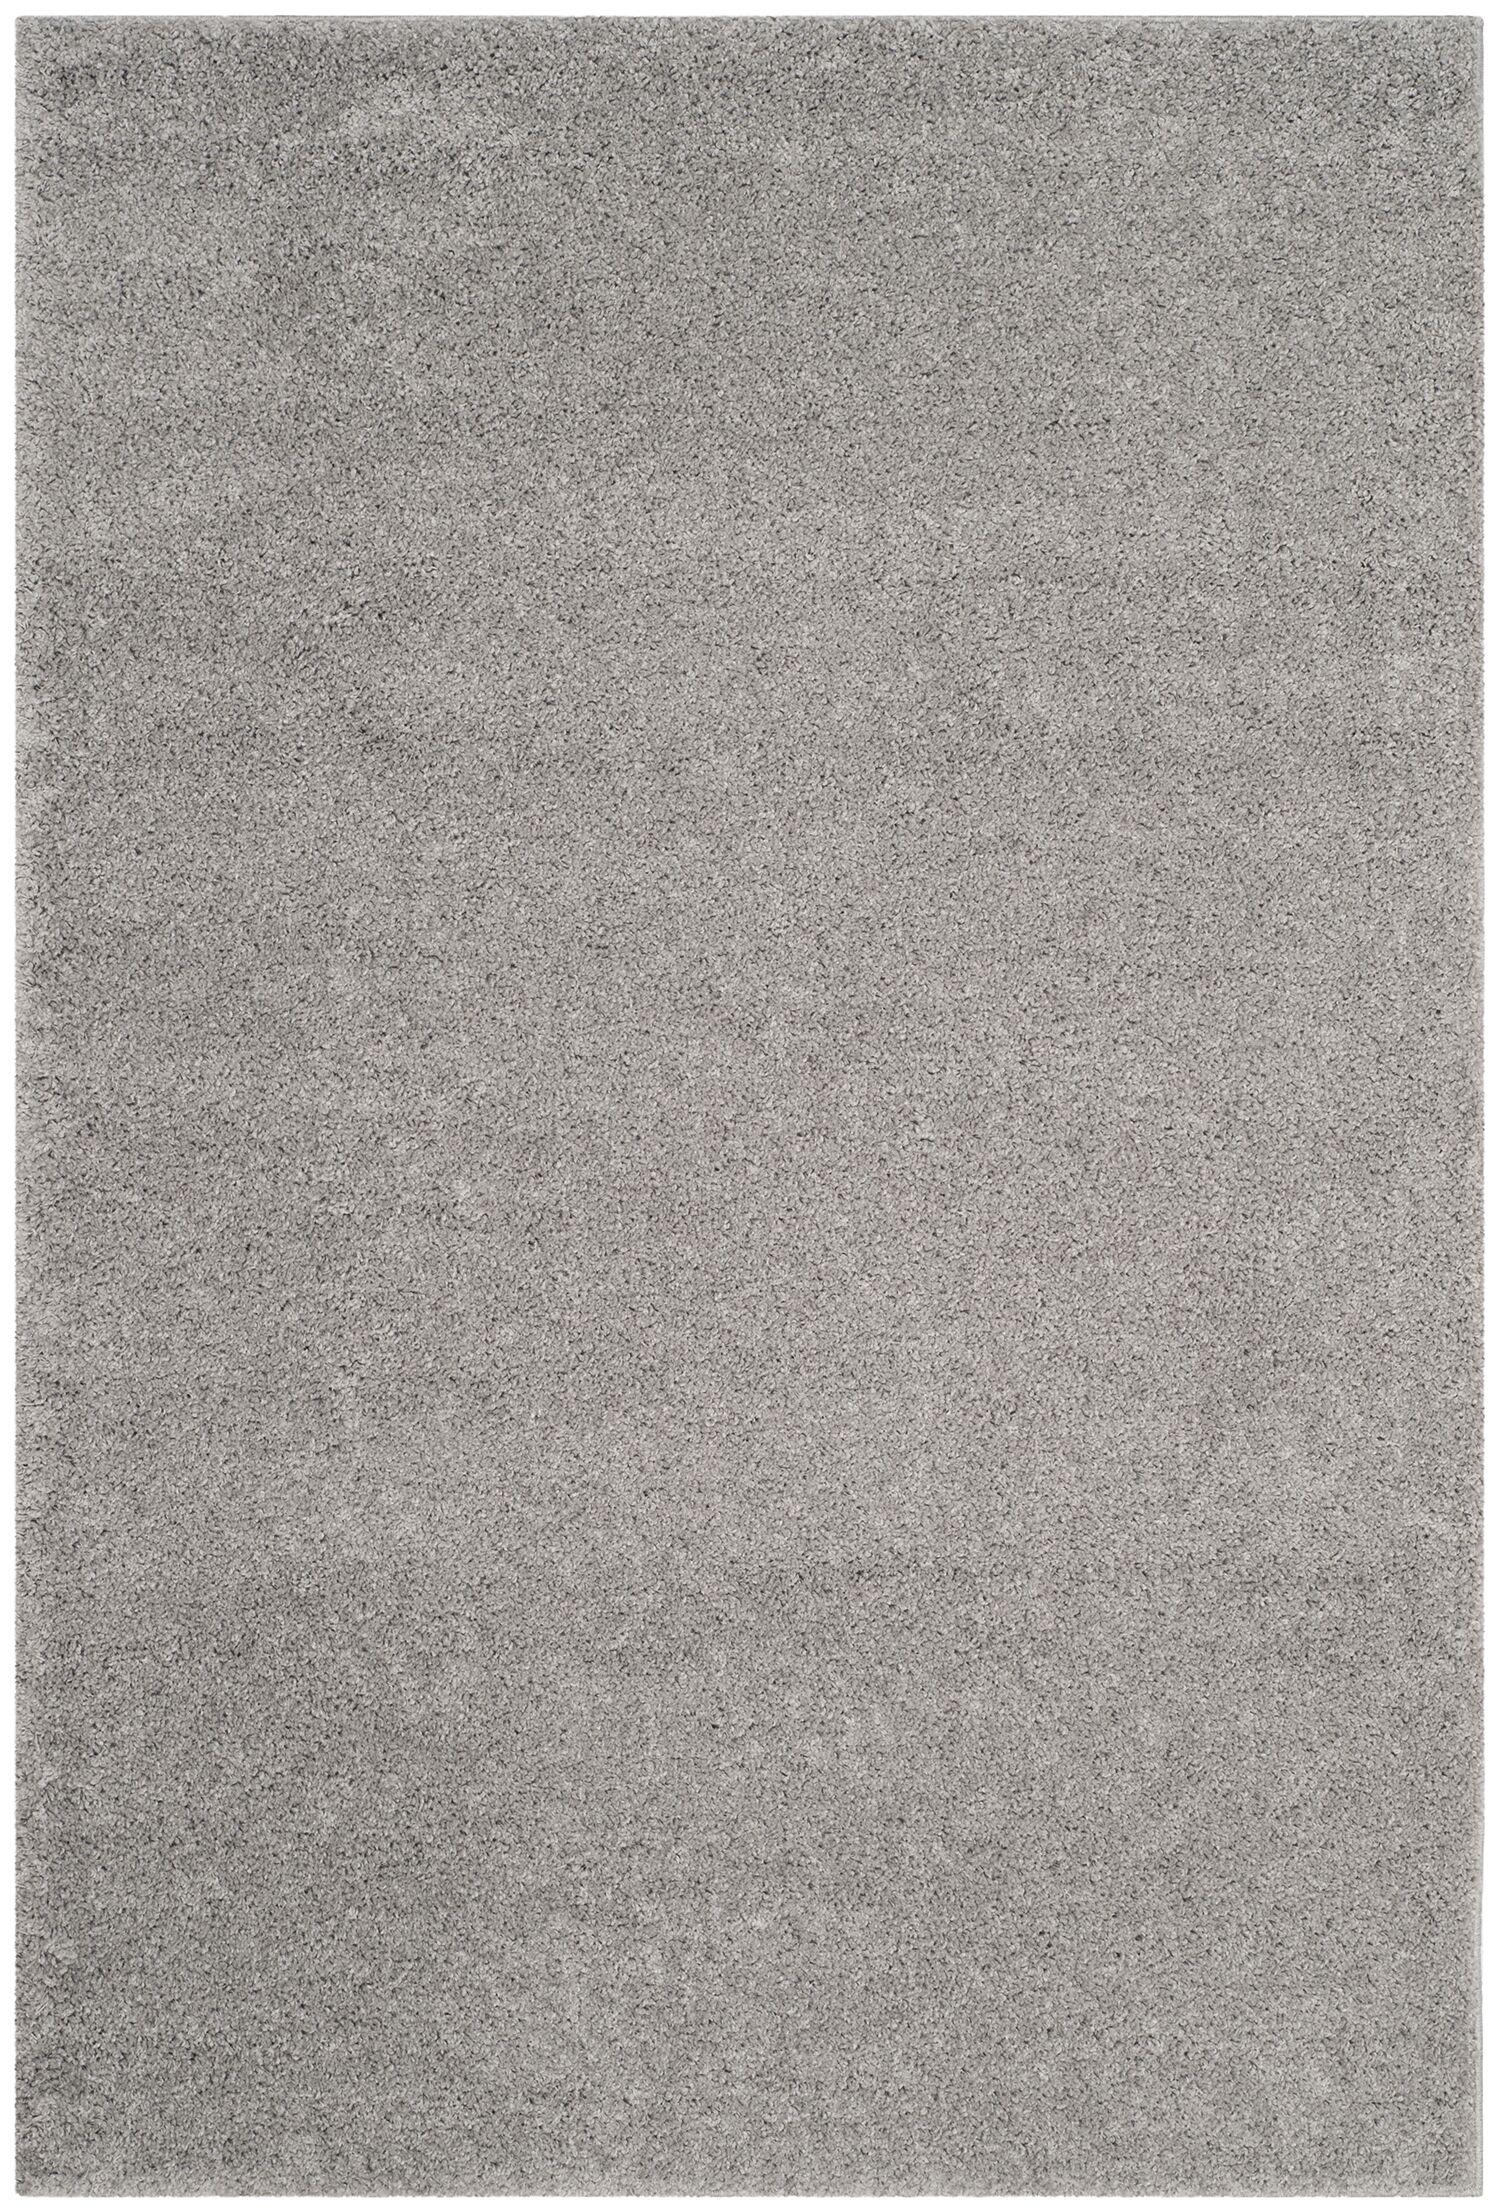 Curran Shag Light Gray Area Rug Rug Size: Rectangle 4' x 6'